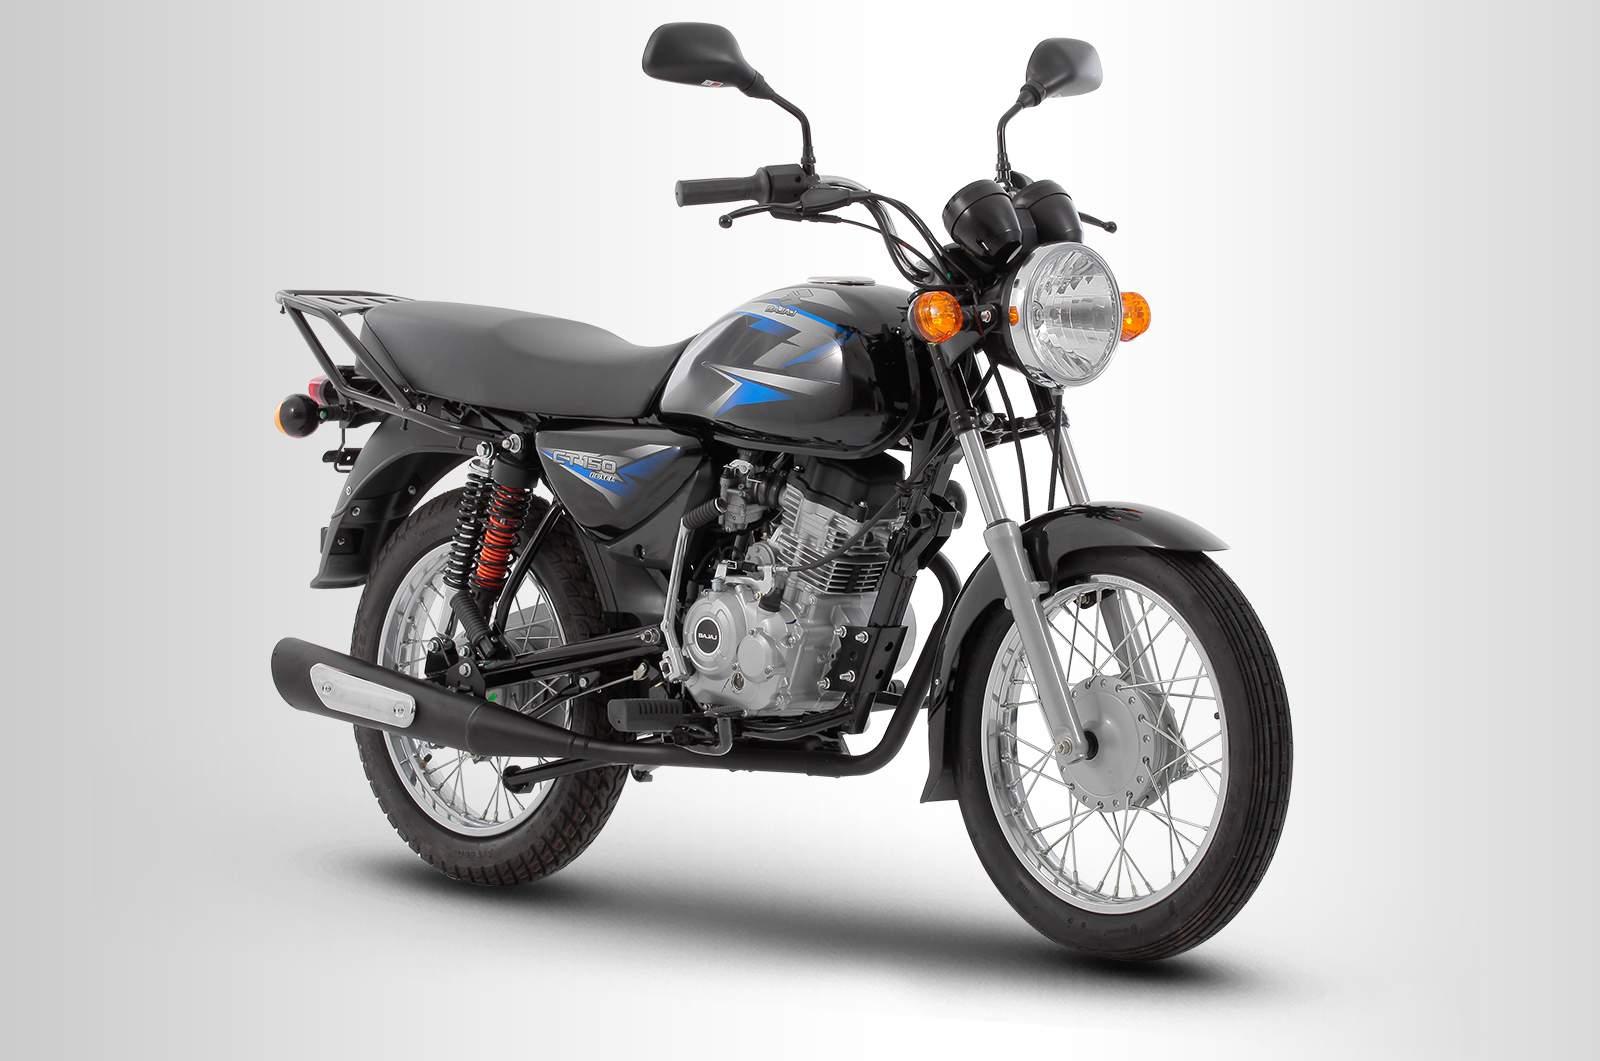 Motor Trade Installment Requirements Kymco People 50 Wiring Diagram Motortrade Philippine S Best Motorcycle Dealer Kawasaki Bajaj